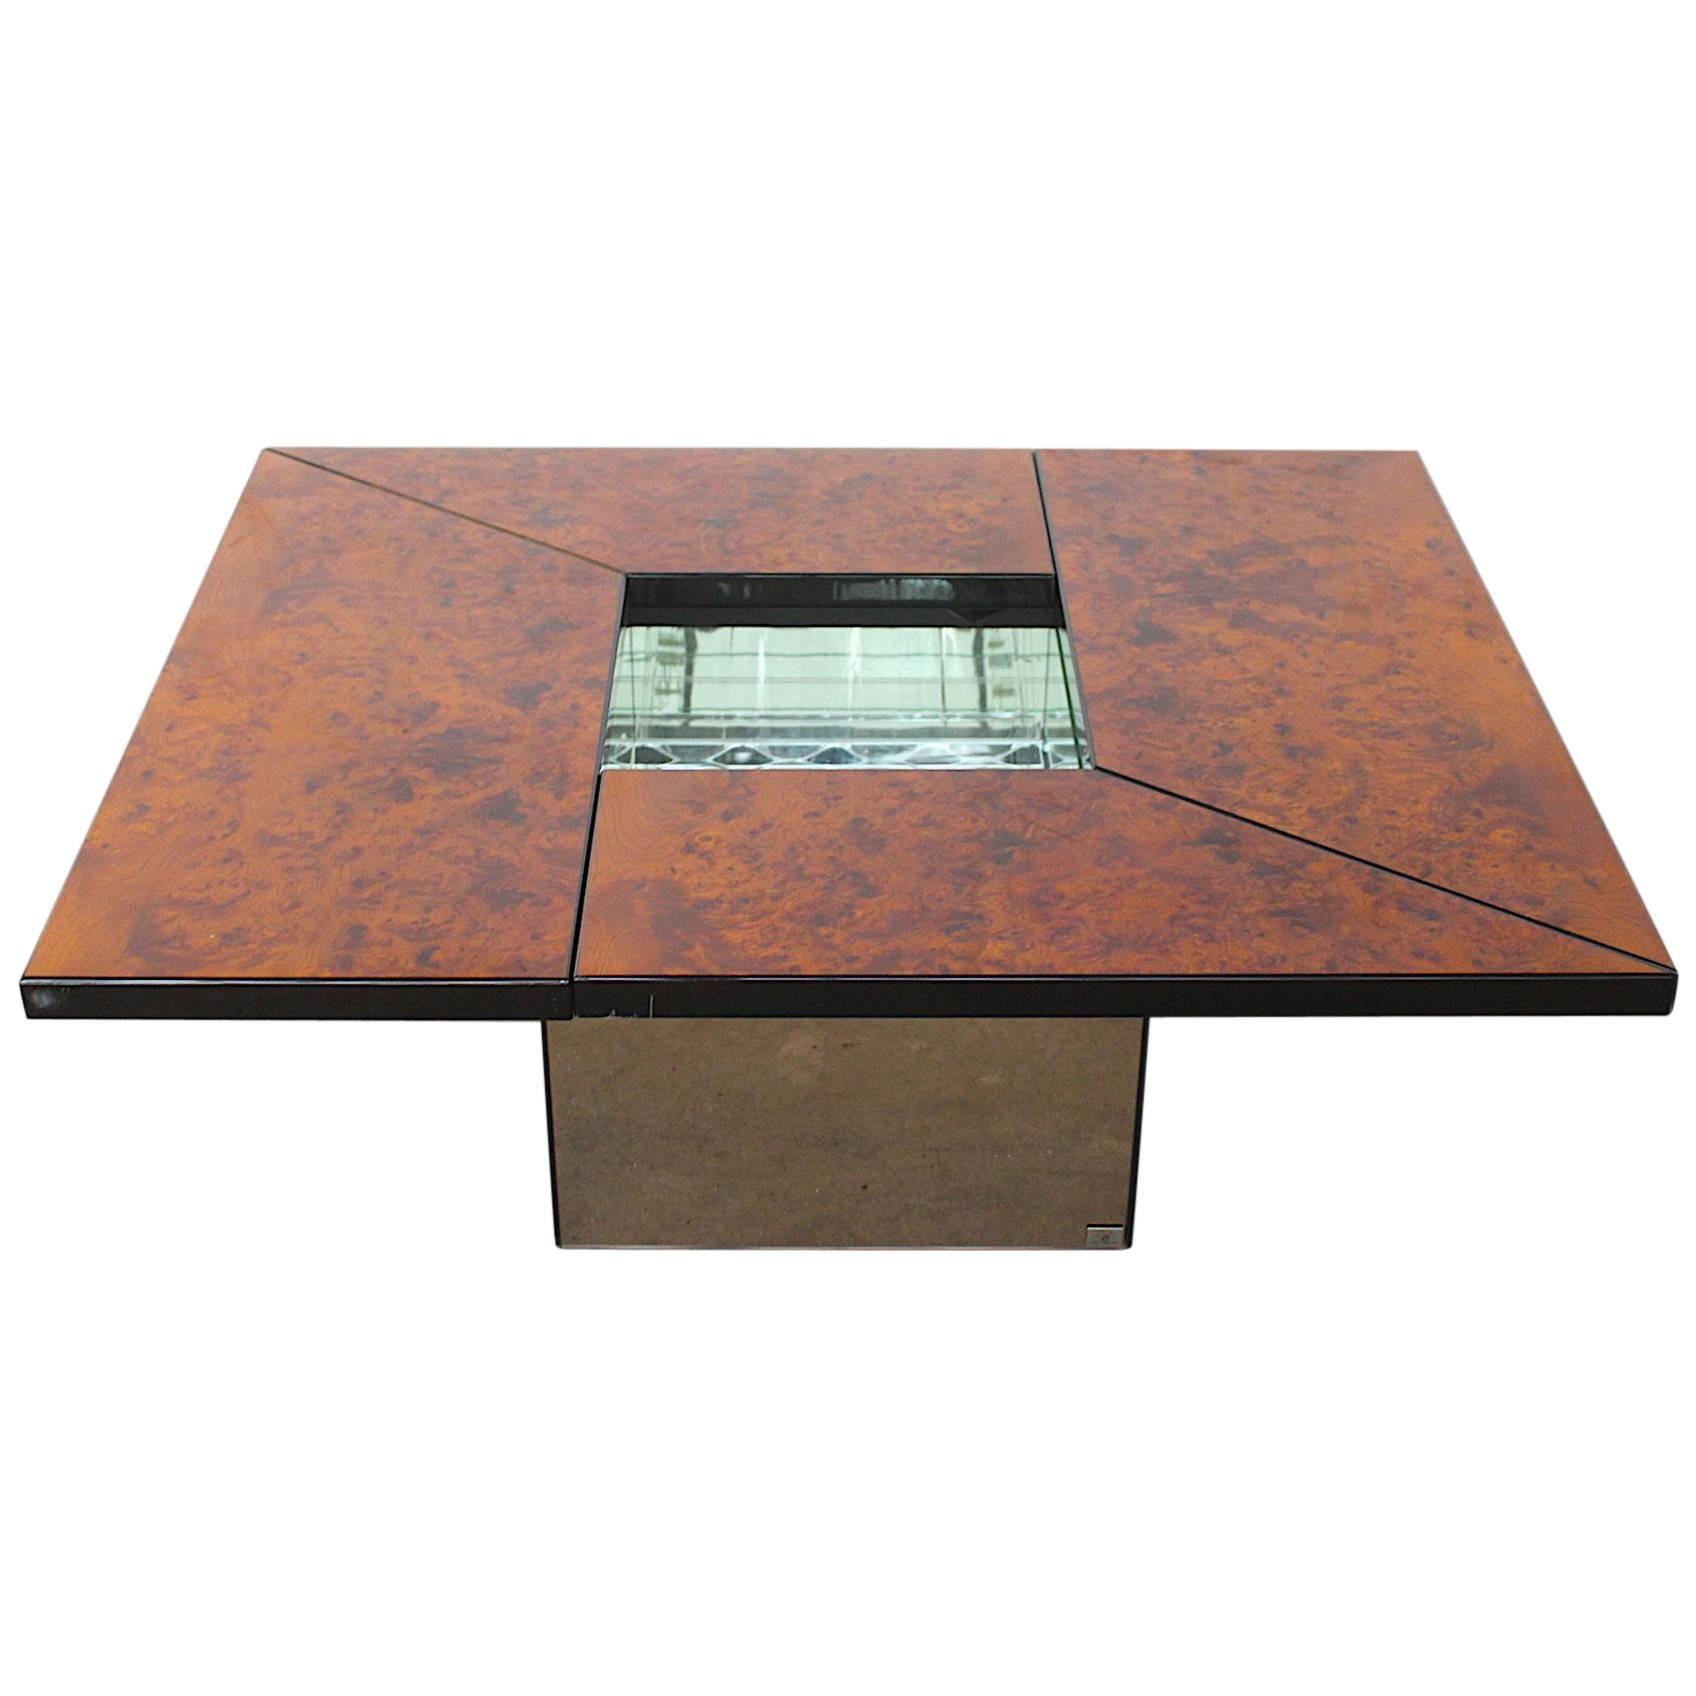 Paul Michel Burl Wood Multi-Functional Coffee Table and Dry Bar